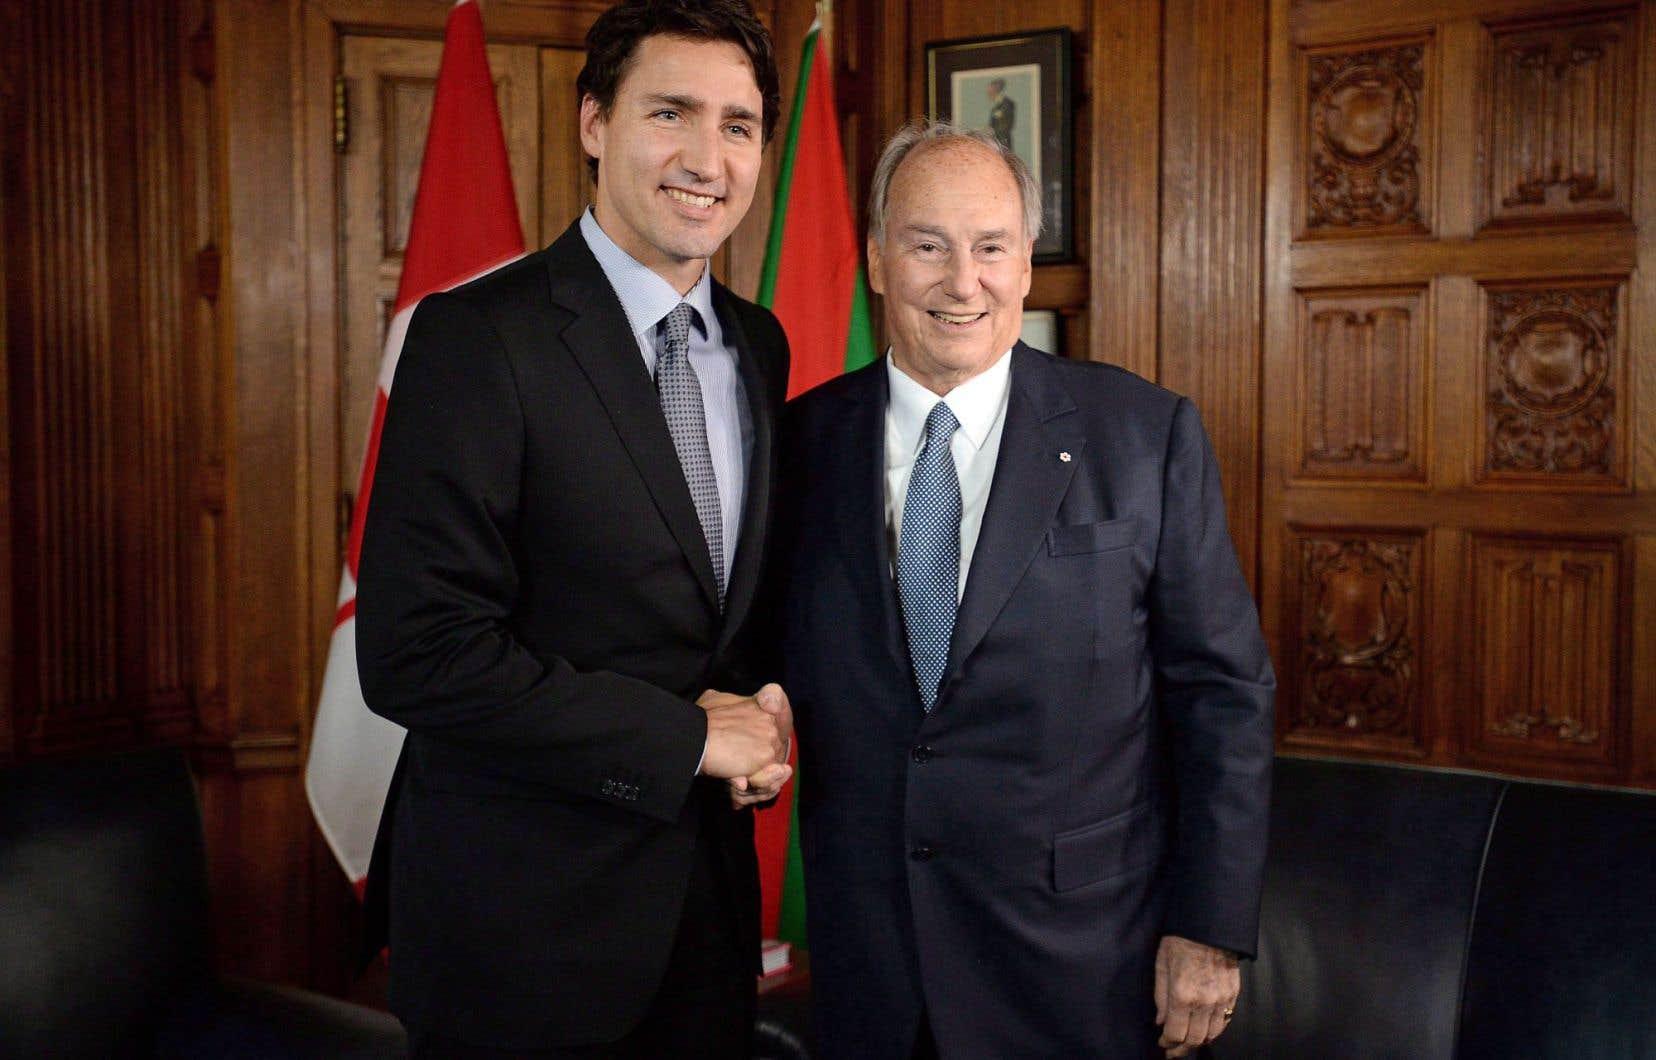 Le premier ministre avait reçu l'Aga Khan à son bureau d'Ottawa en mai dernier.